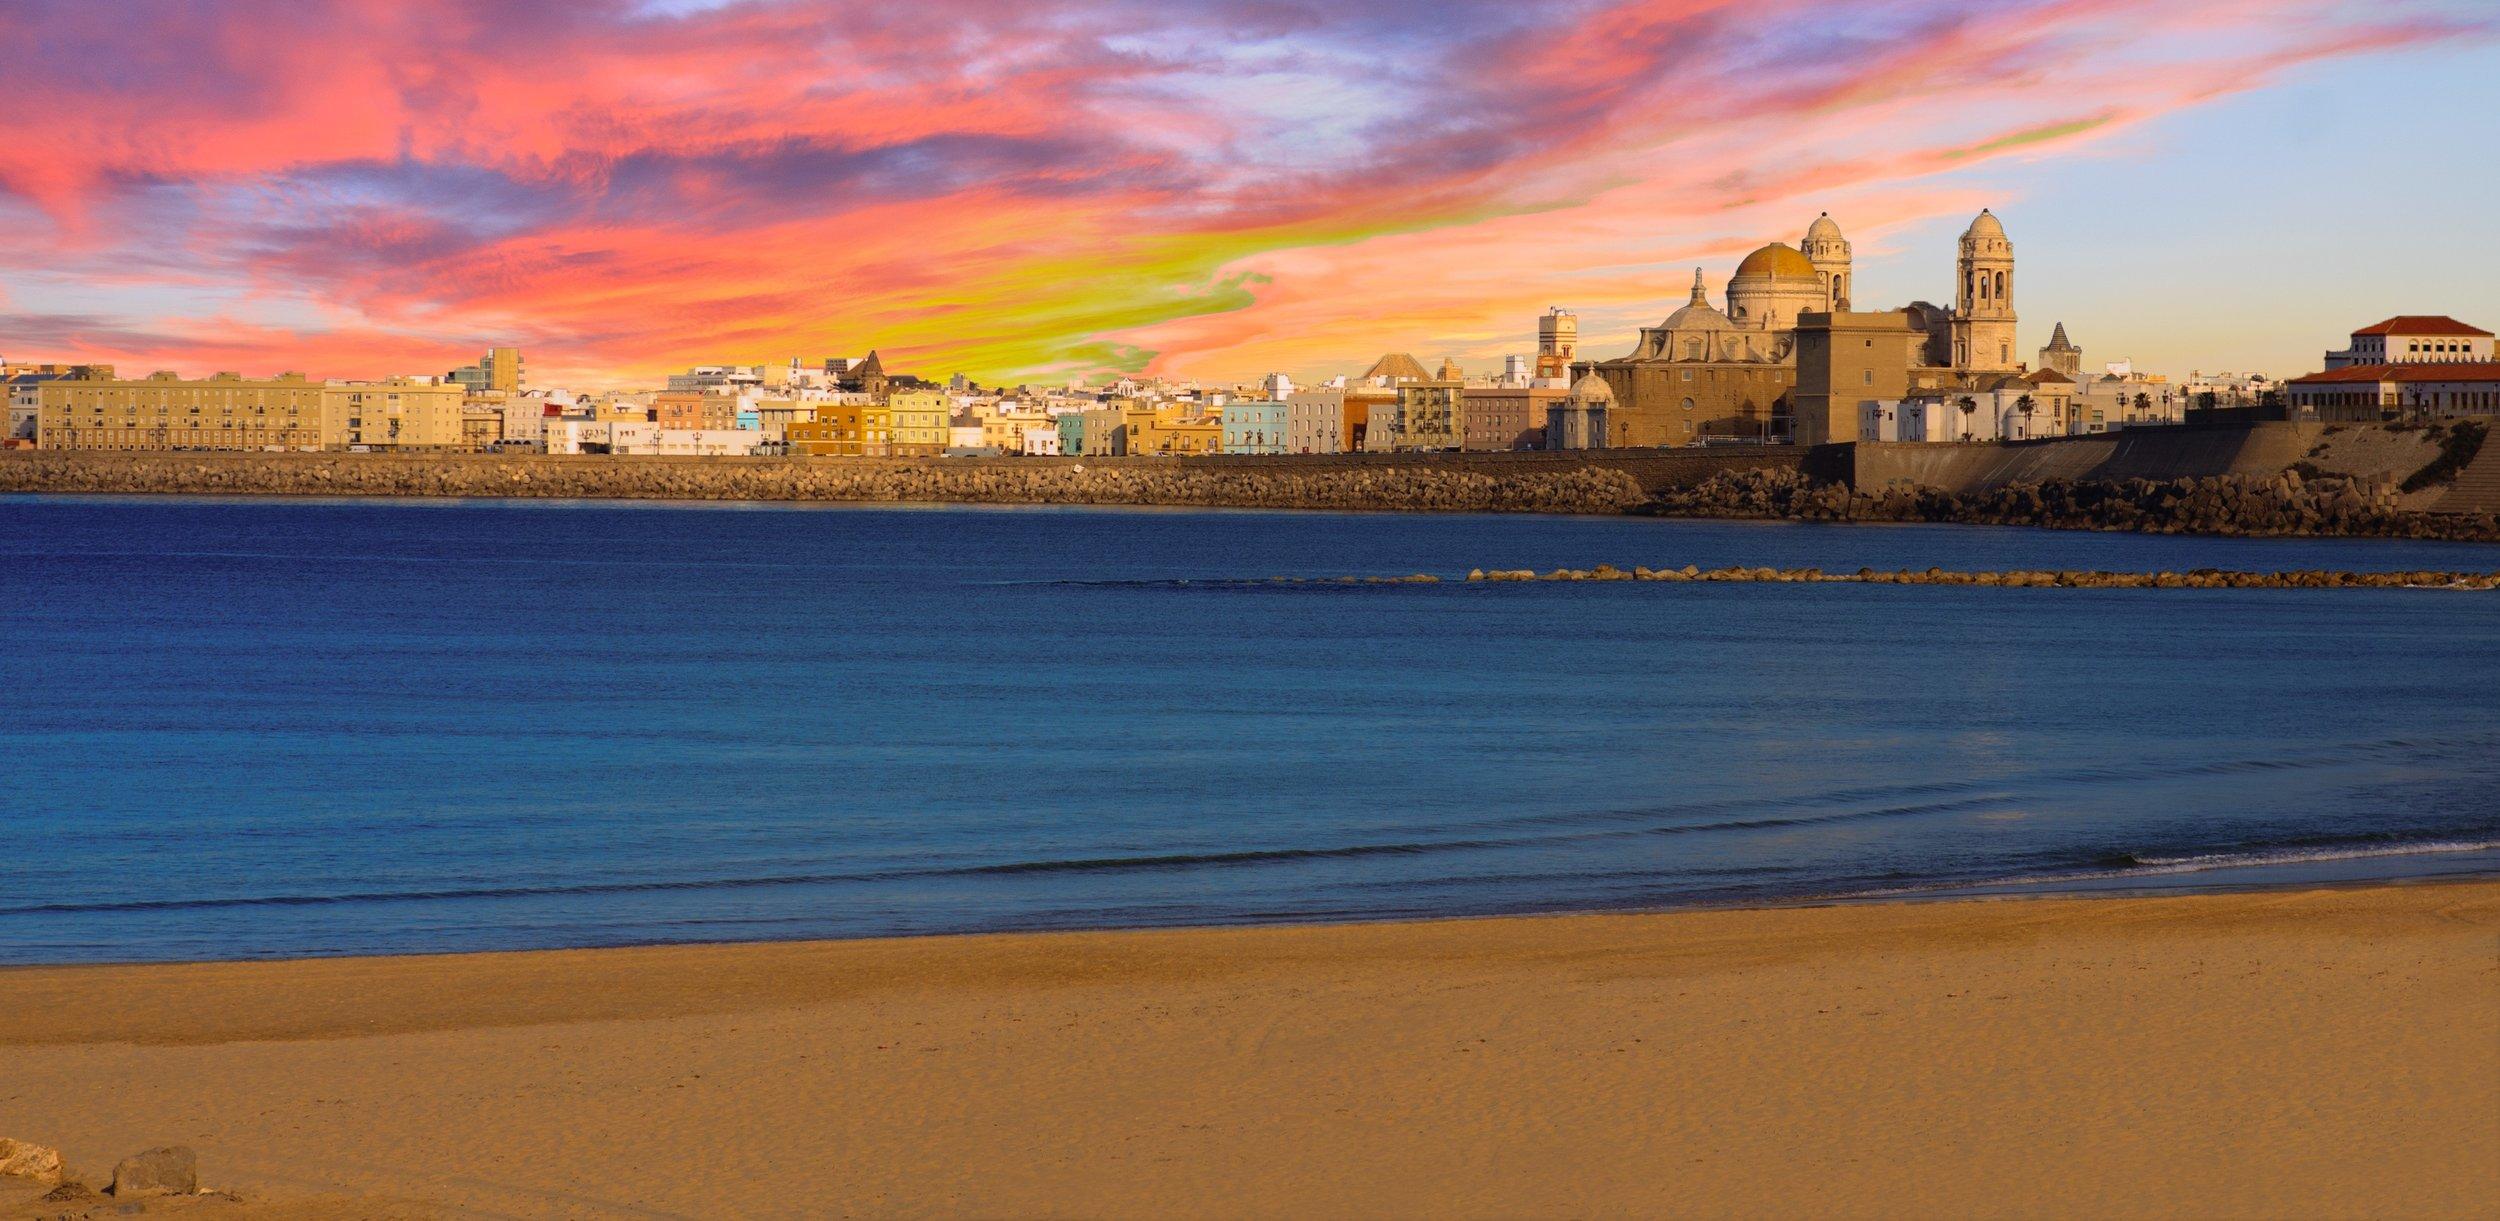 Cadiz_view_from_beach.jpeg